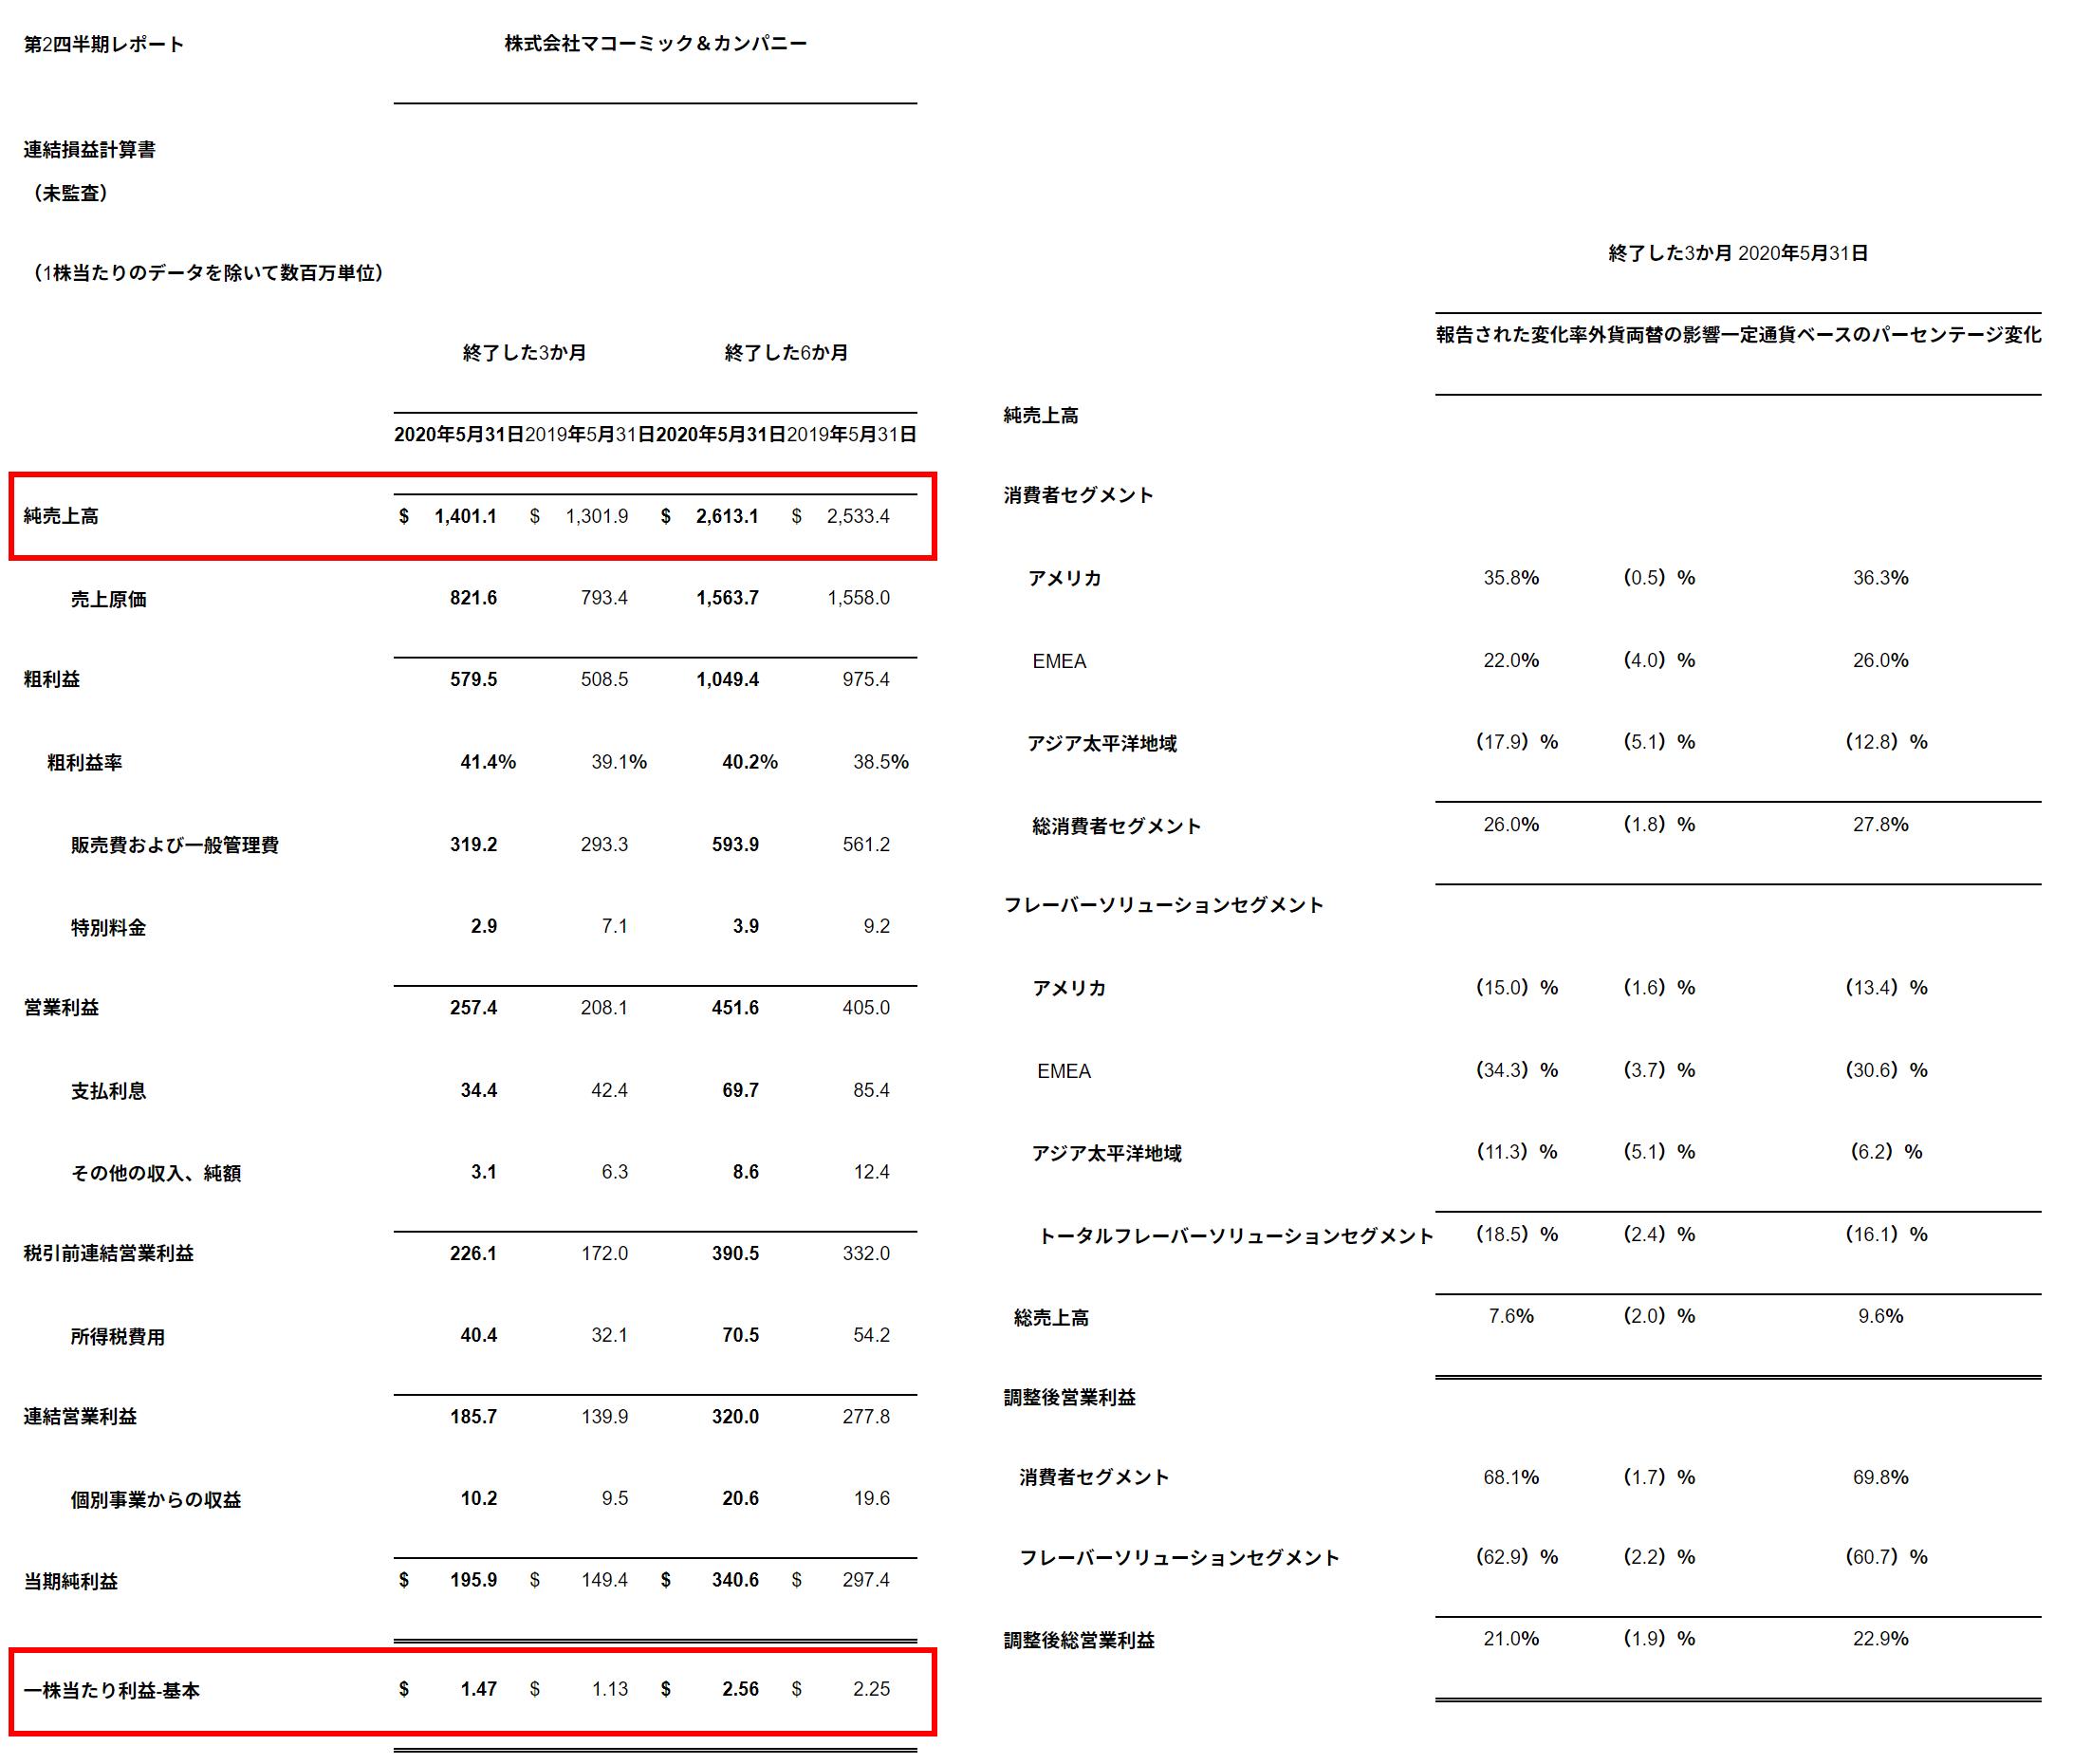 f:id:hodo-work:20200629085332p:plain